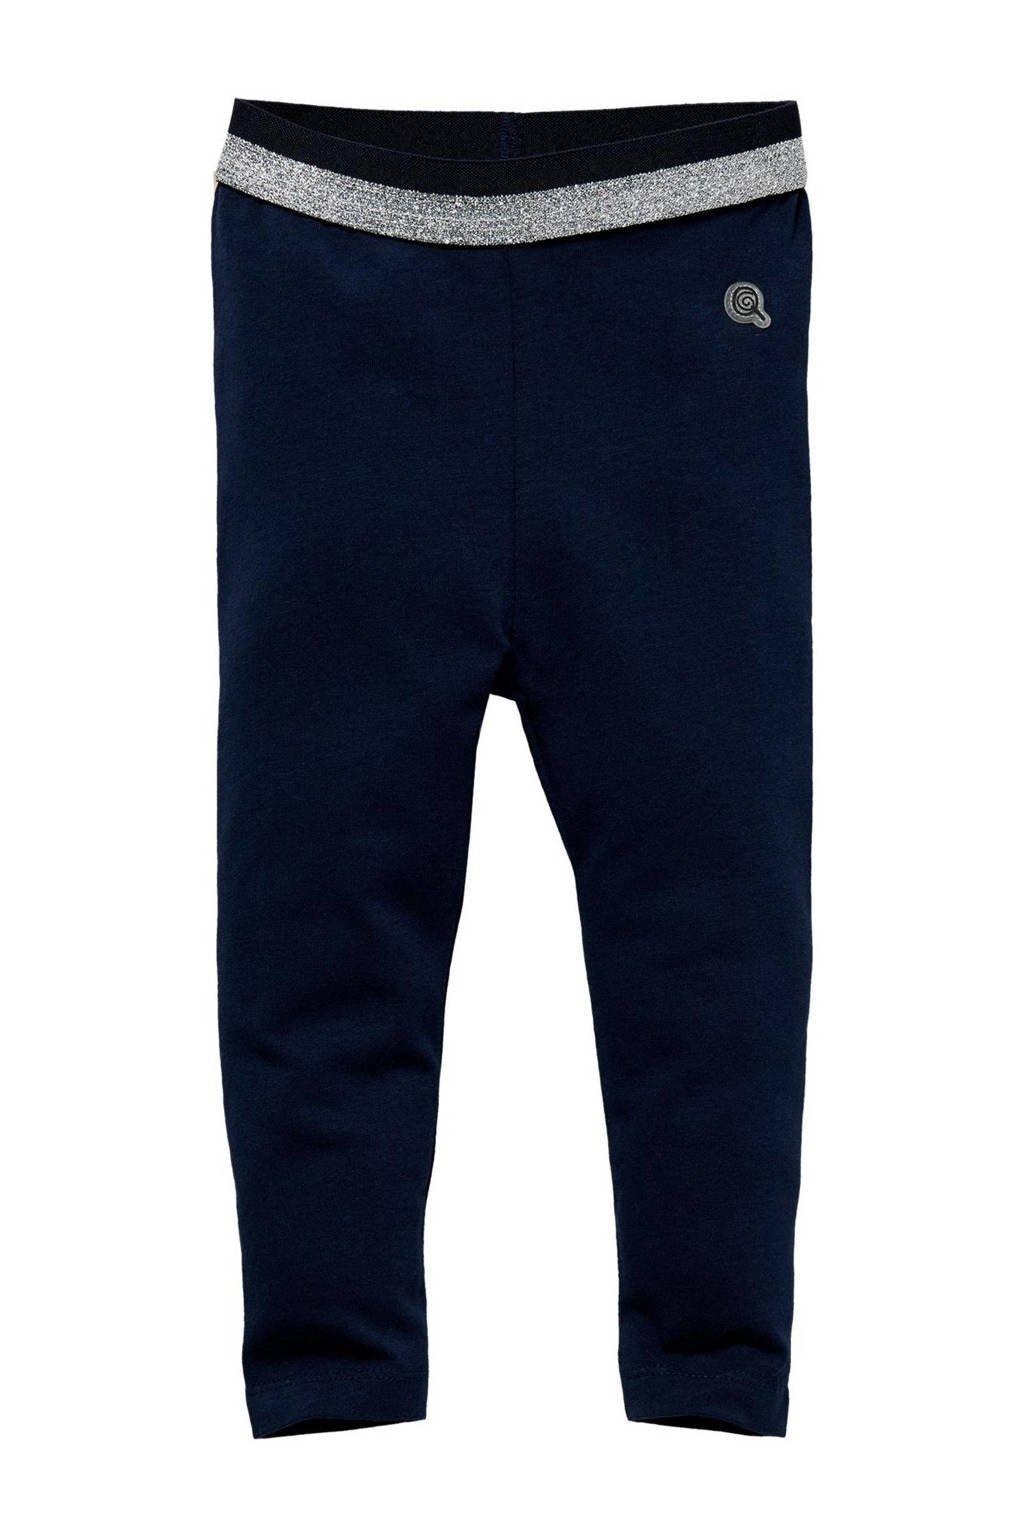 Quapi Mini regular fit legging Lou donkerblauw, Donkerblauw